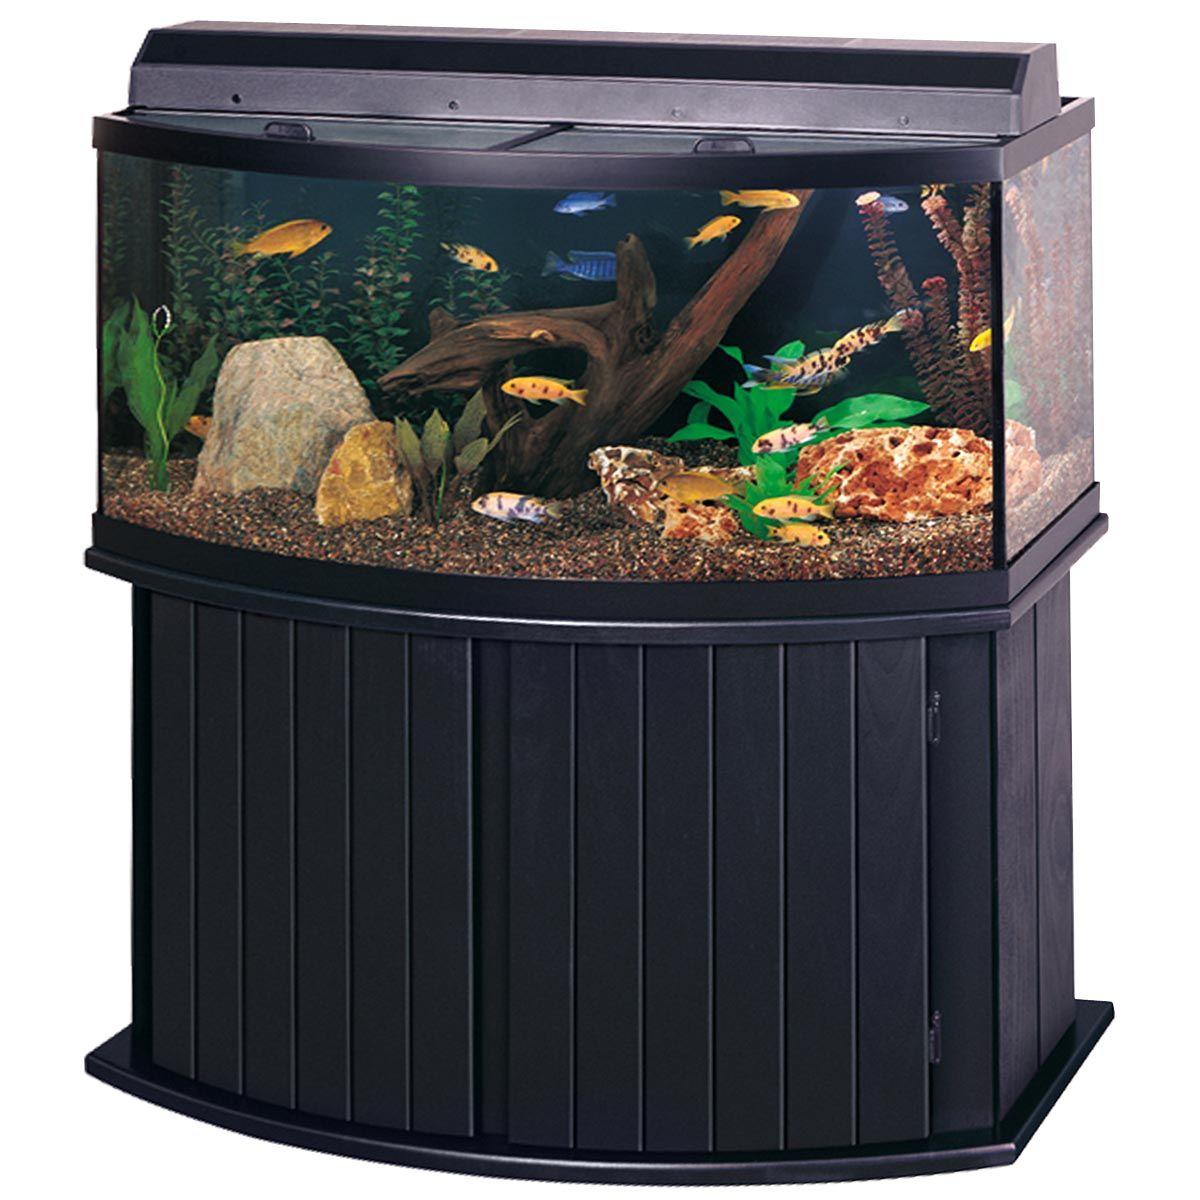 100 Gallon Glass Bow Front Aquarium | Aquarium Ideas | Bow